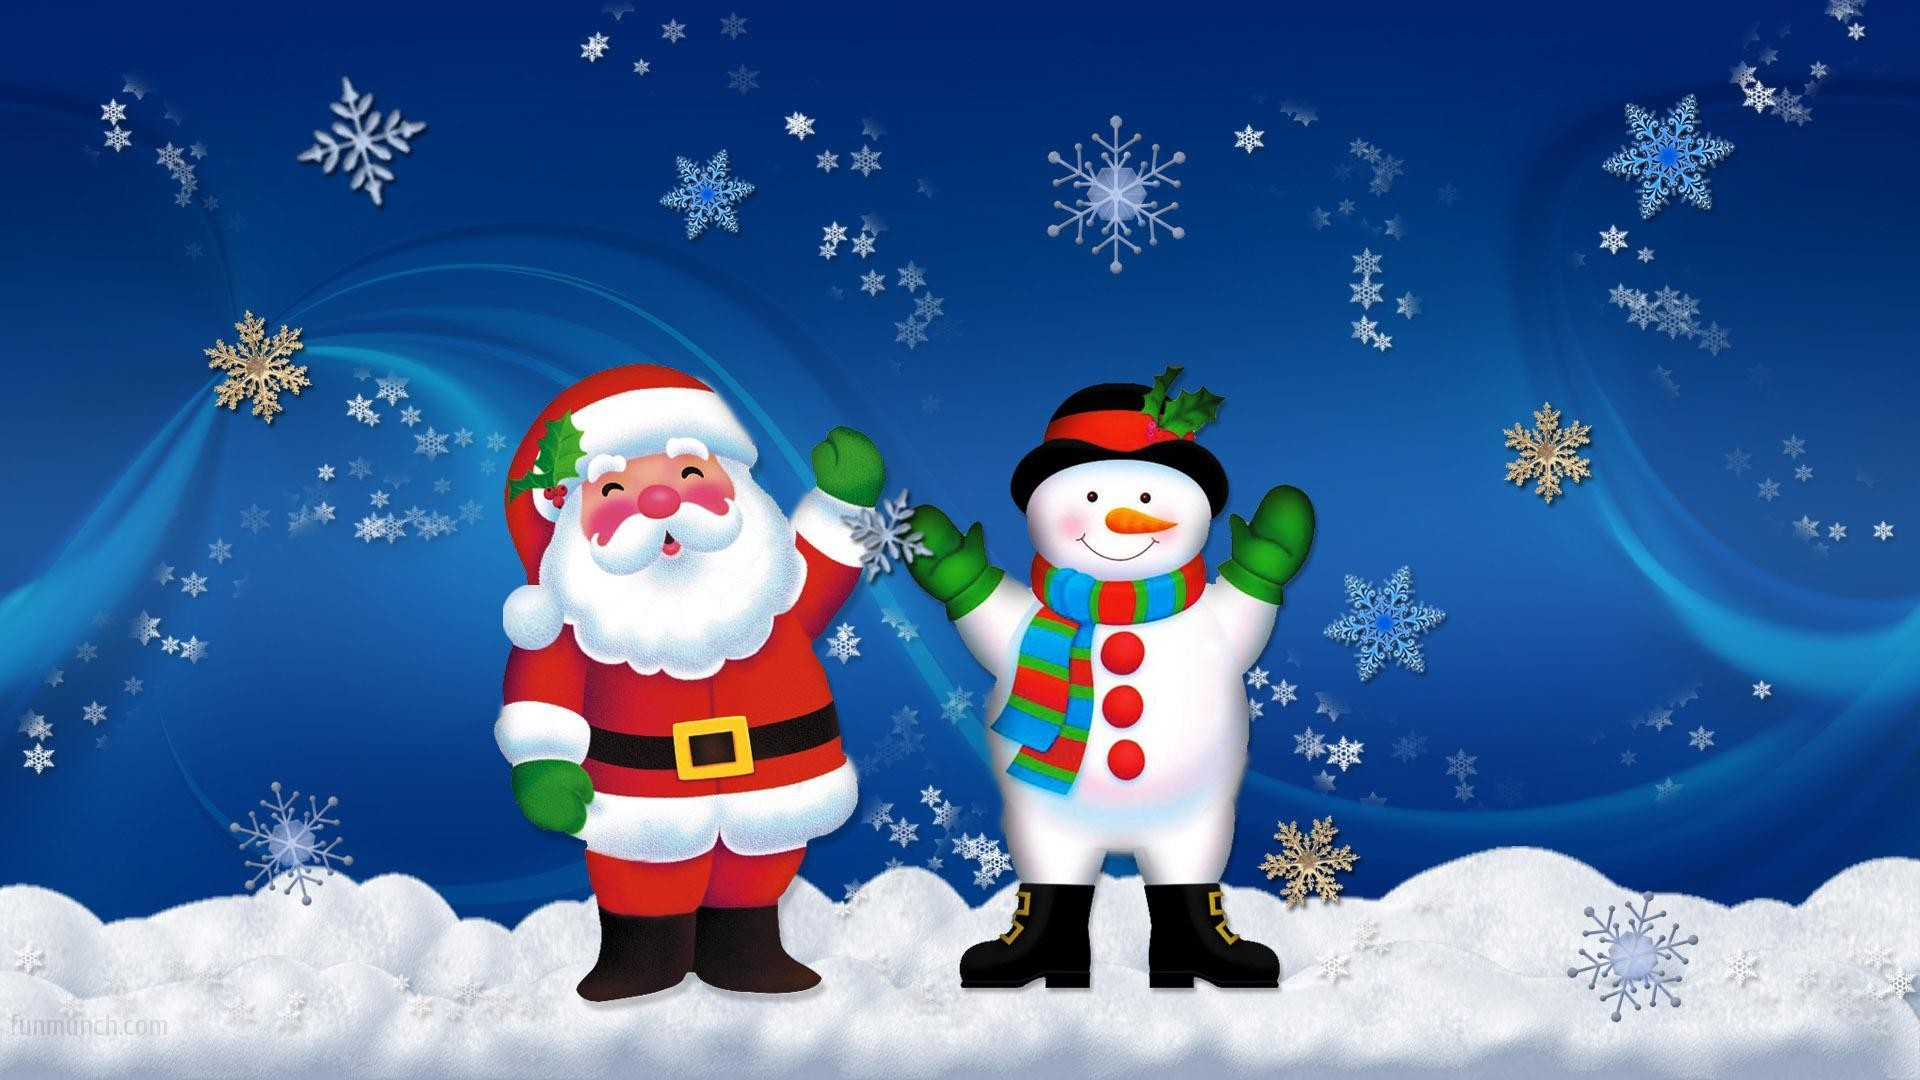 Christmas Desktop Backgrounds, wallpaper, Animated Christmas Desktop .